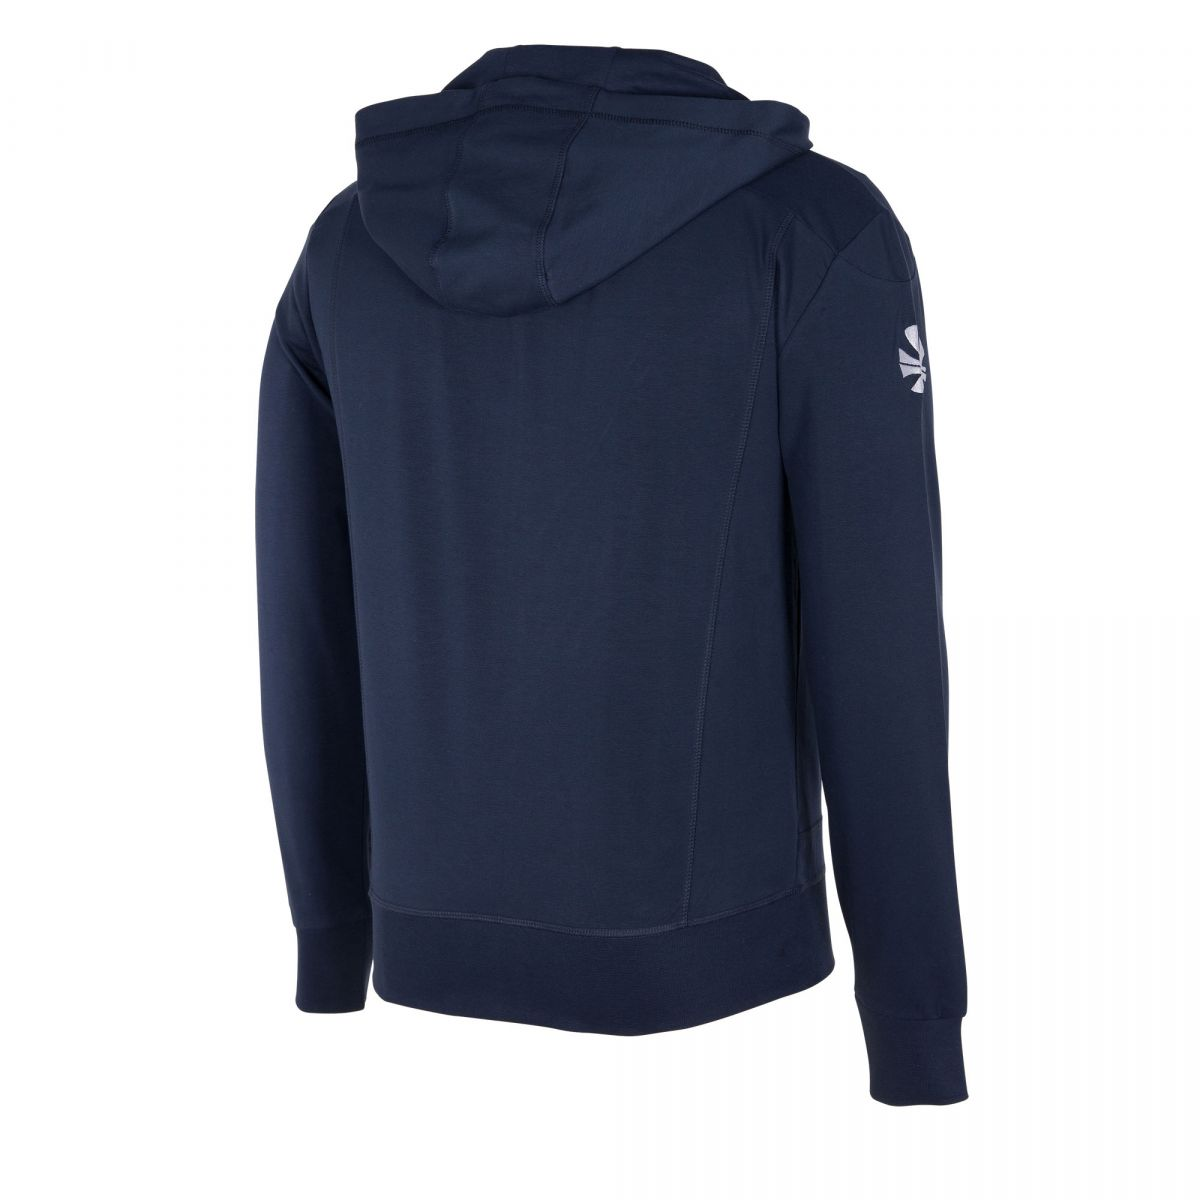 Reece Australia Kapuzenjacke Hoodie Größe L Neu Reecepreis 49,95 Euro